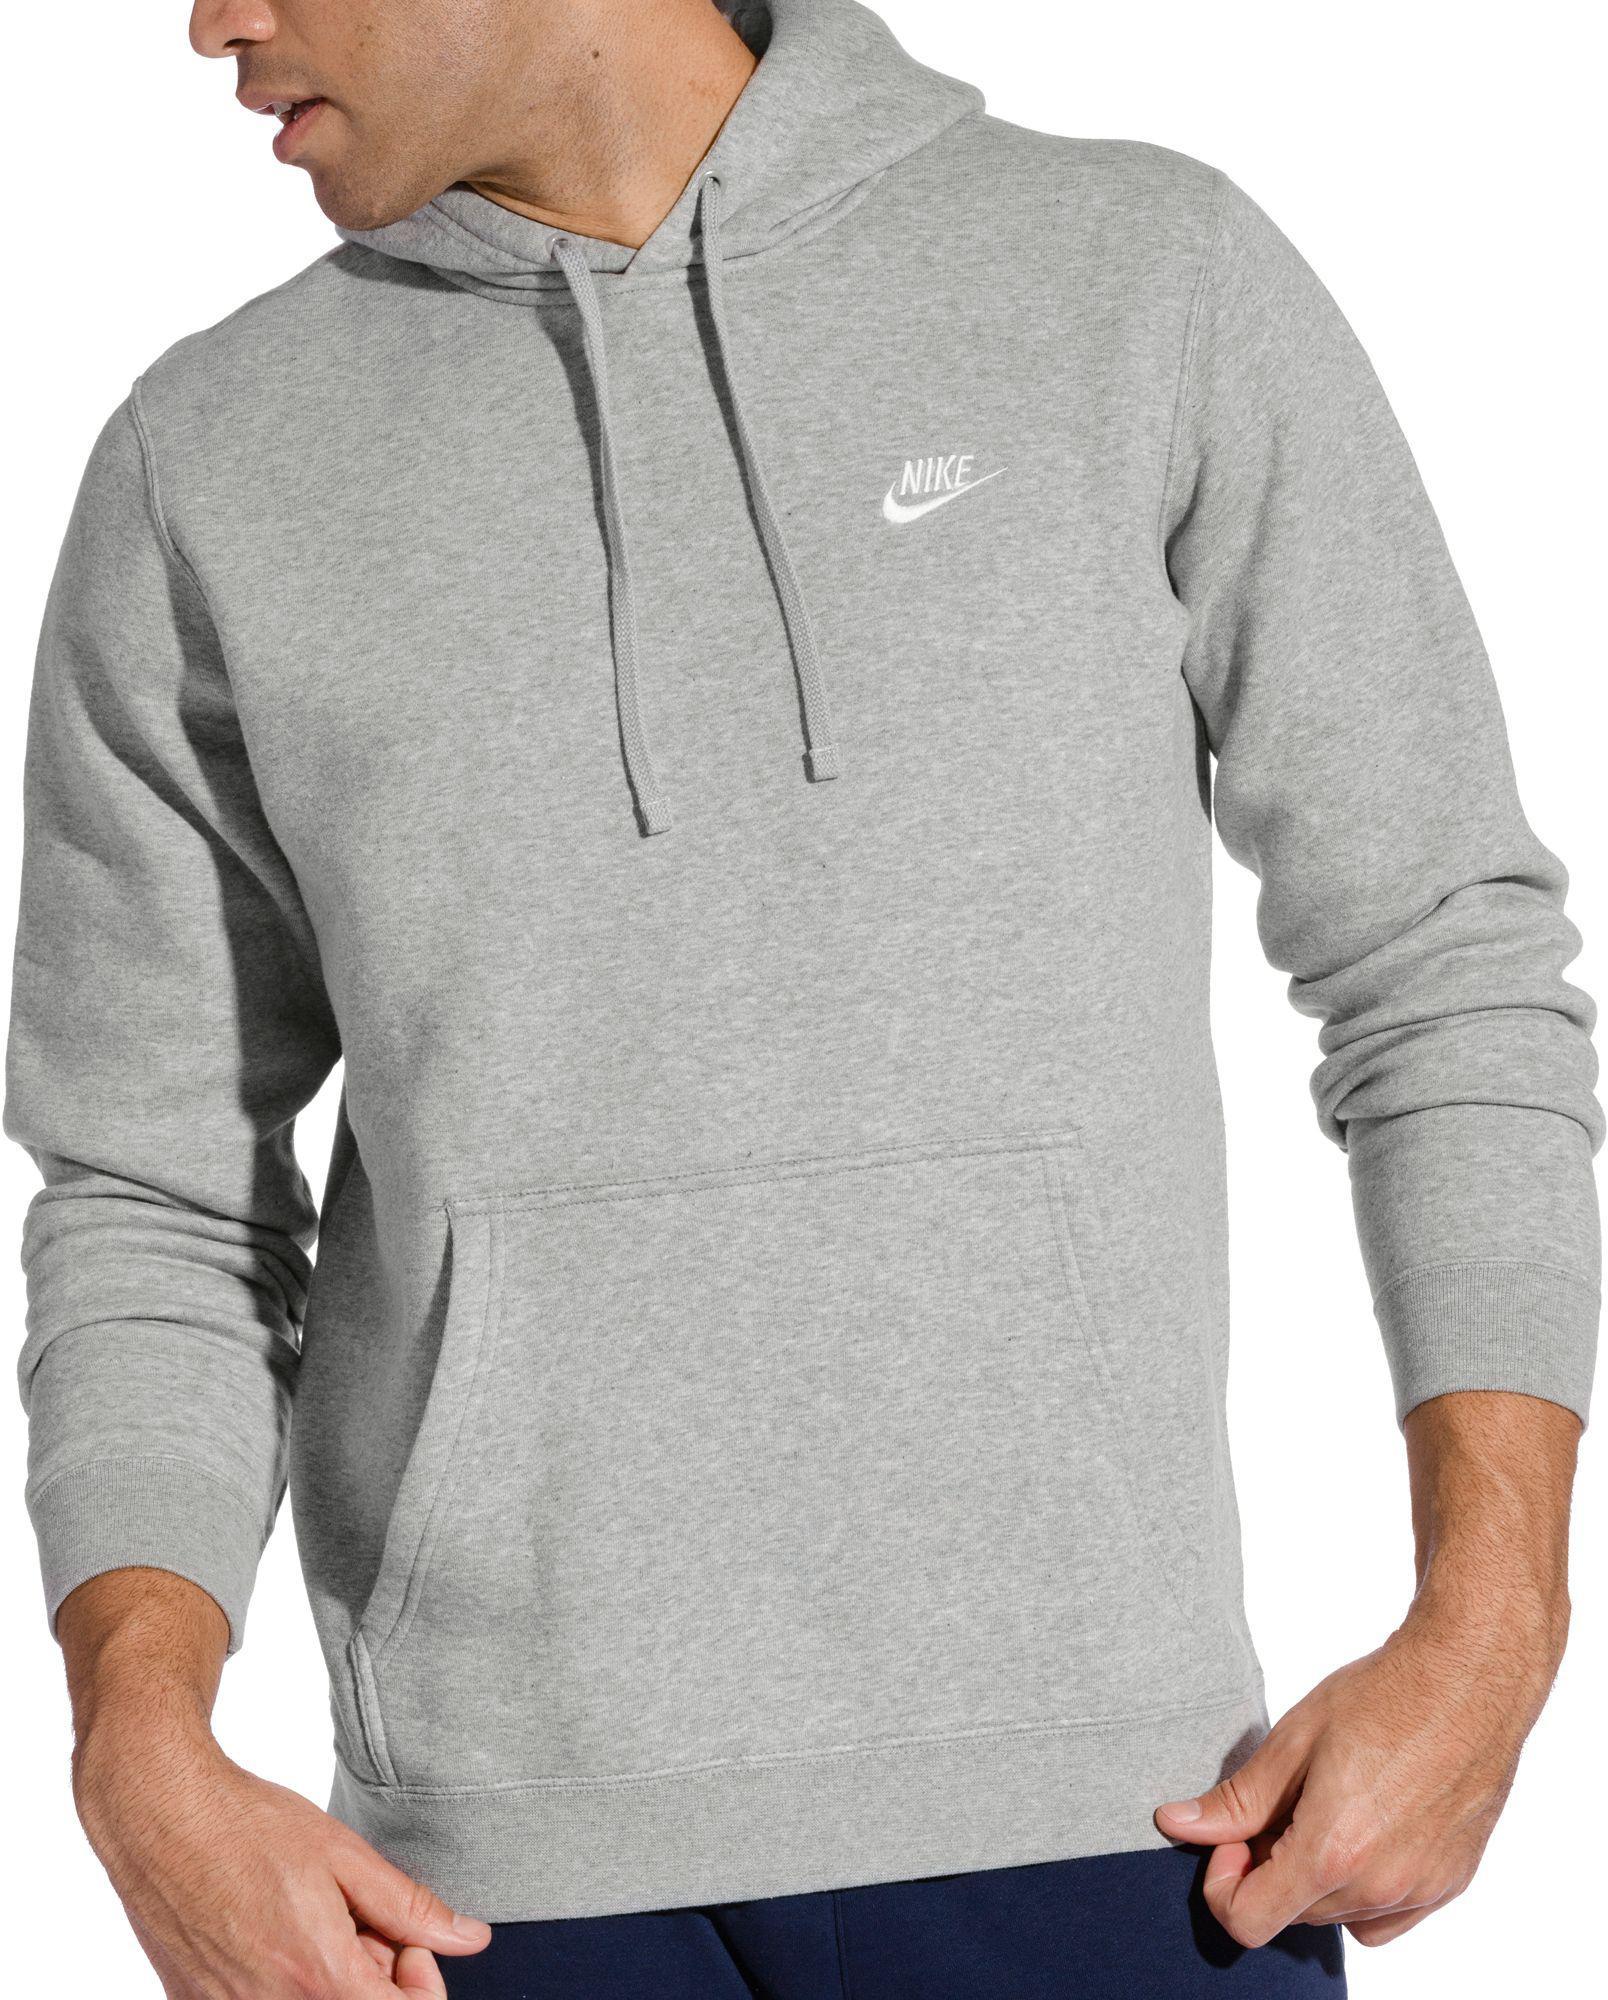 Lyst - Nike Club Fleece Pullover Hoodie in Gray for Men 1dc7d86b191b